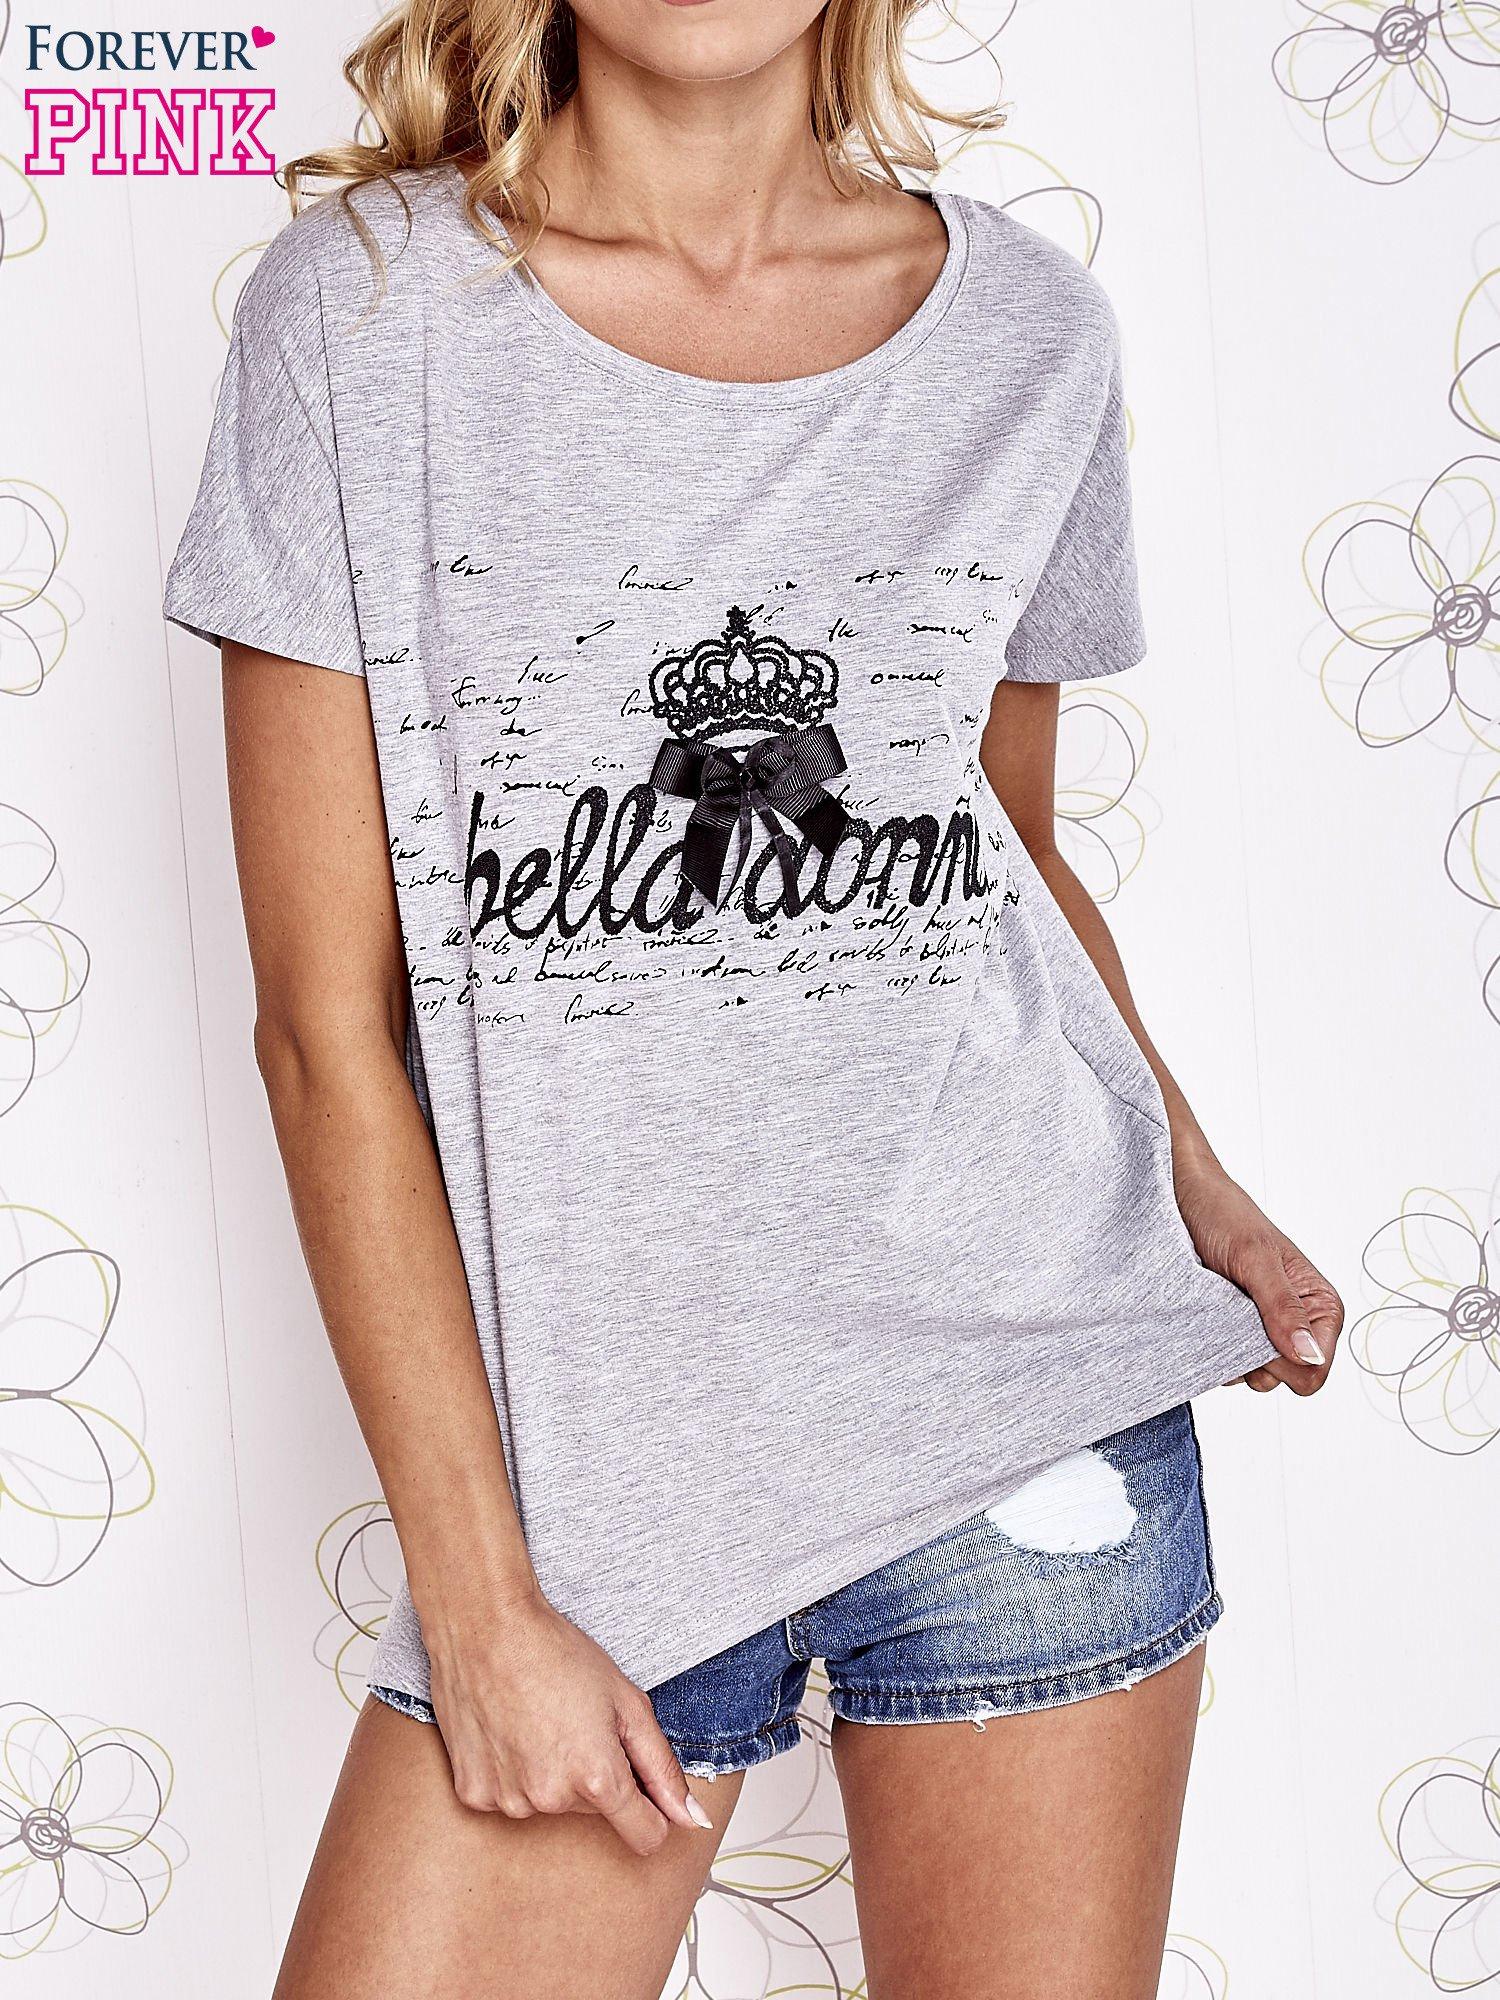 Szary t-shirt z ozdobnym napisem i kokardą                                  zdj.                                  1